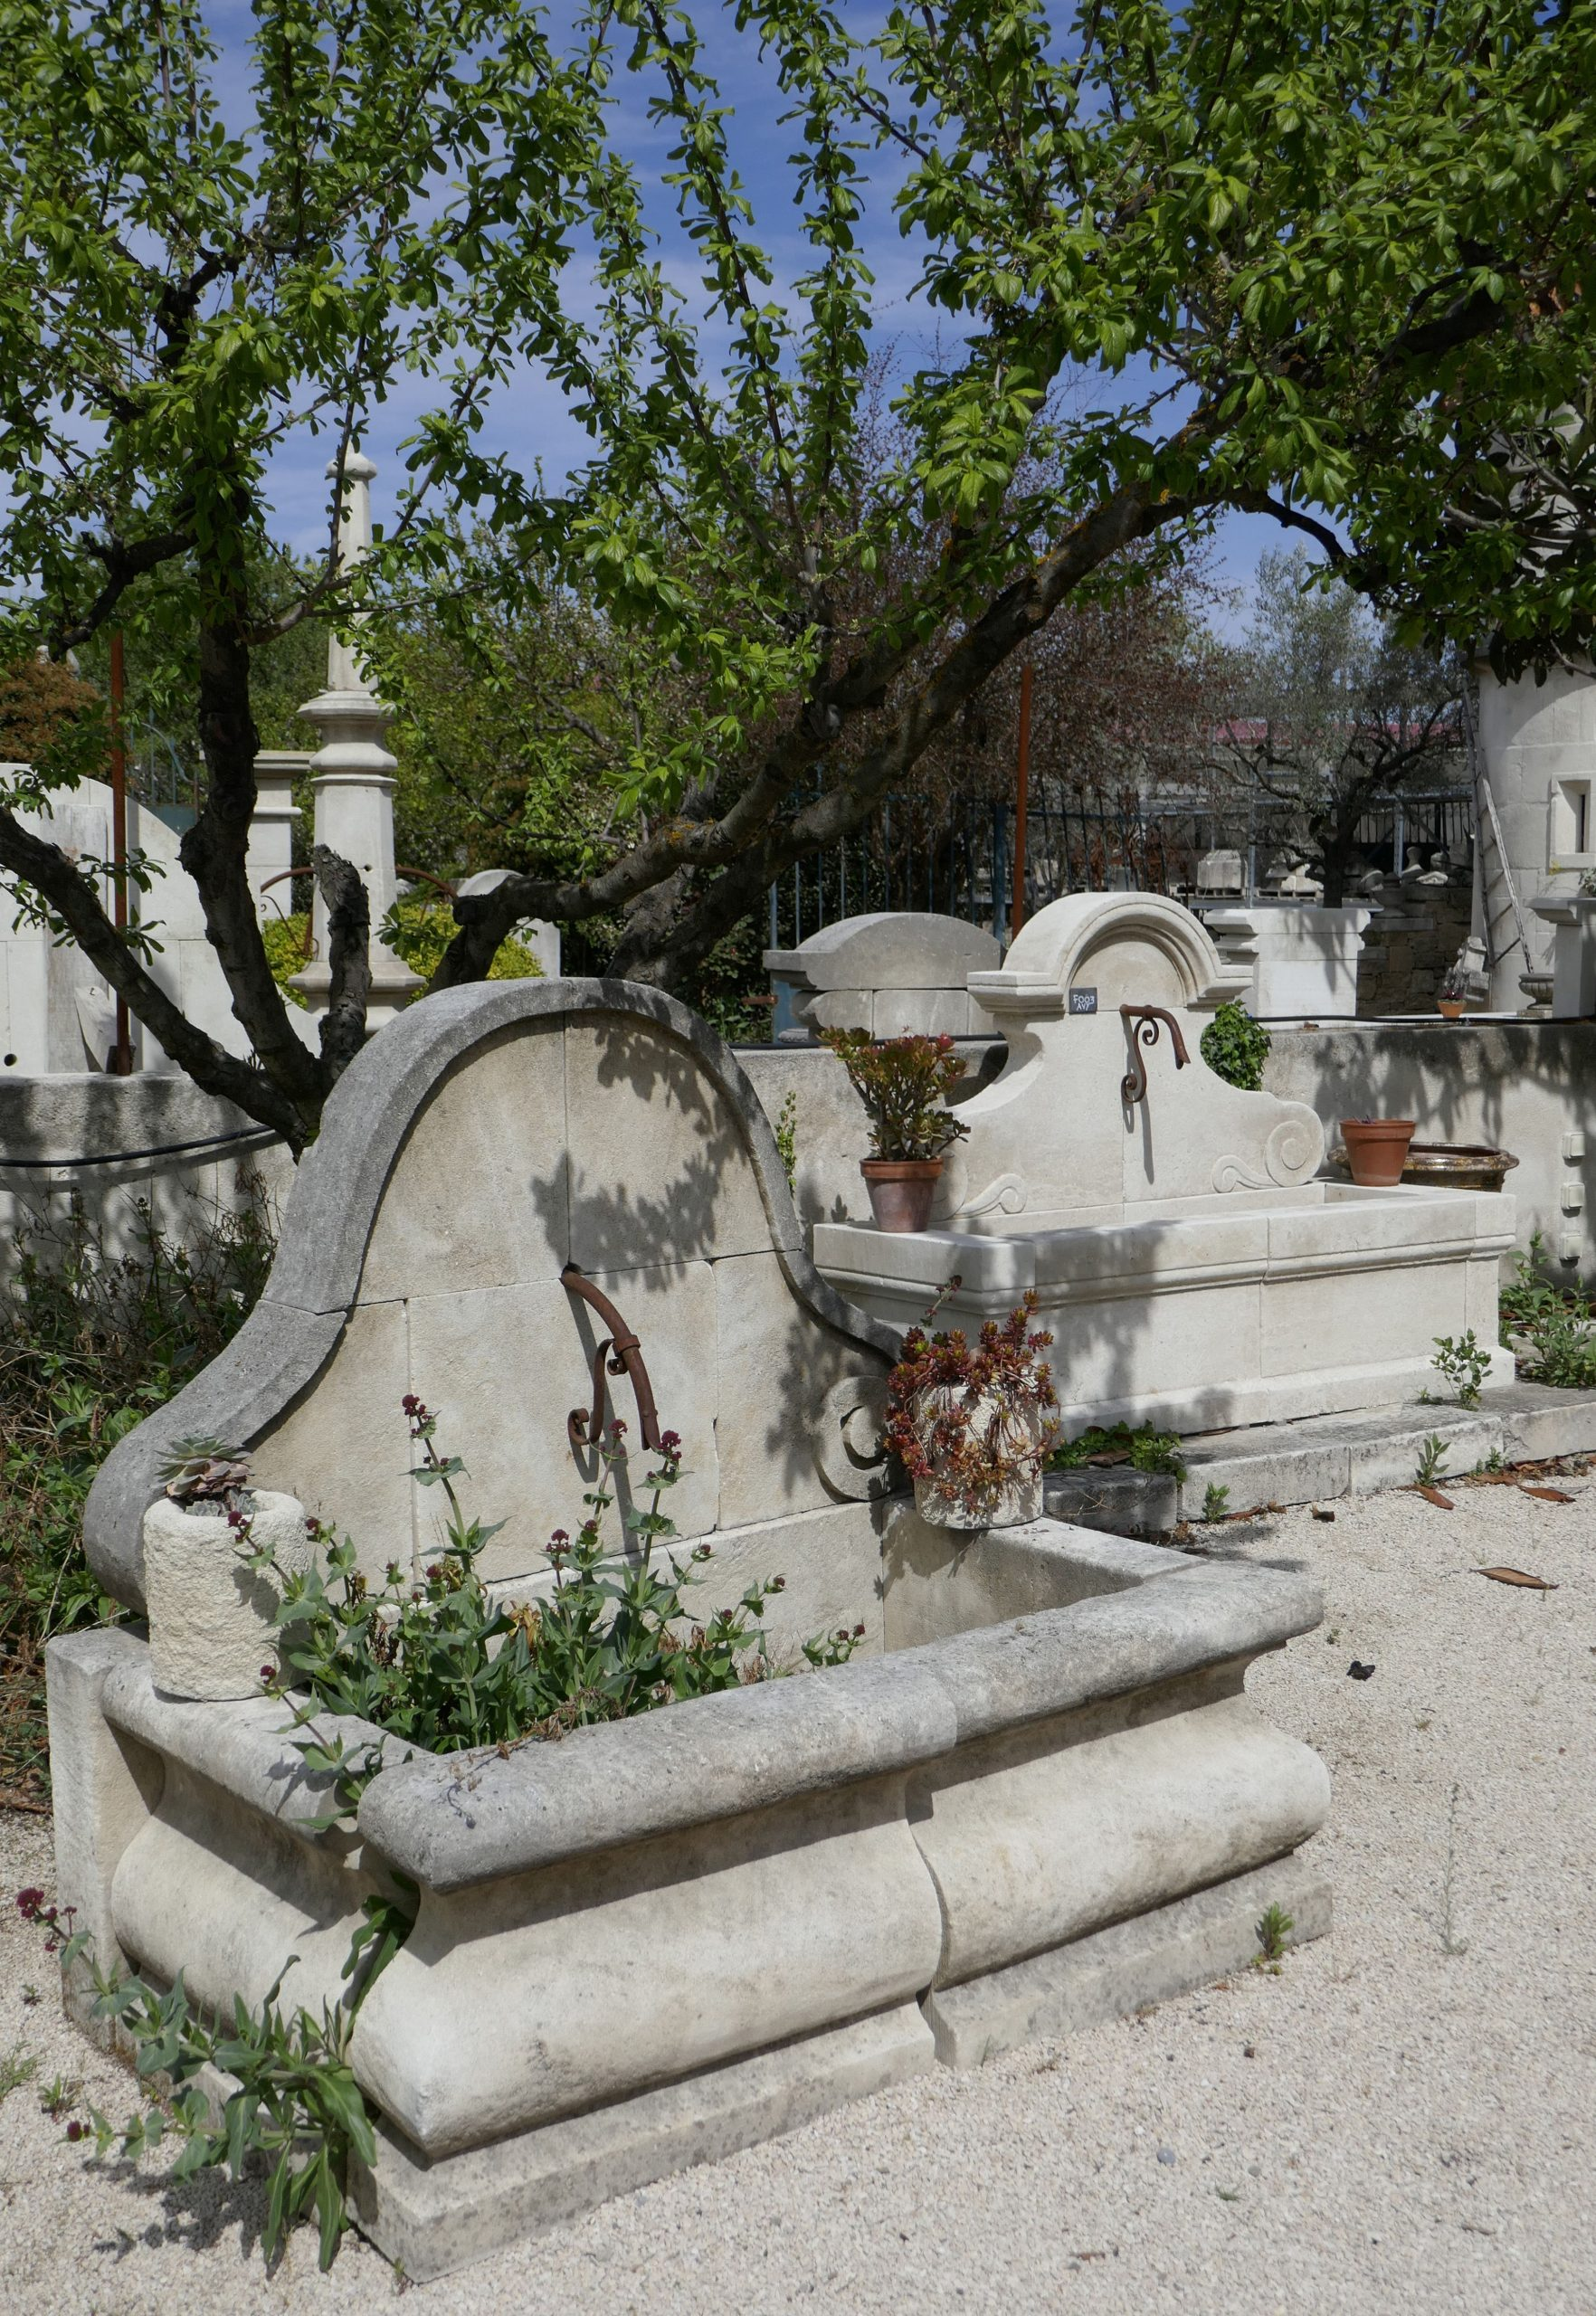 Cette Élégante Petite Fontaine De Jardin Est Une Fontaine ... pour Petite Fontaine De Jardin